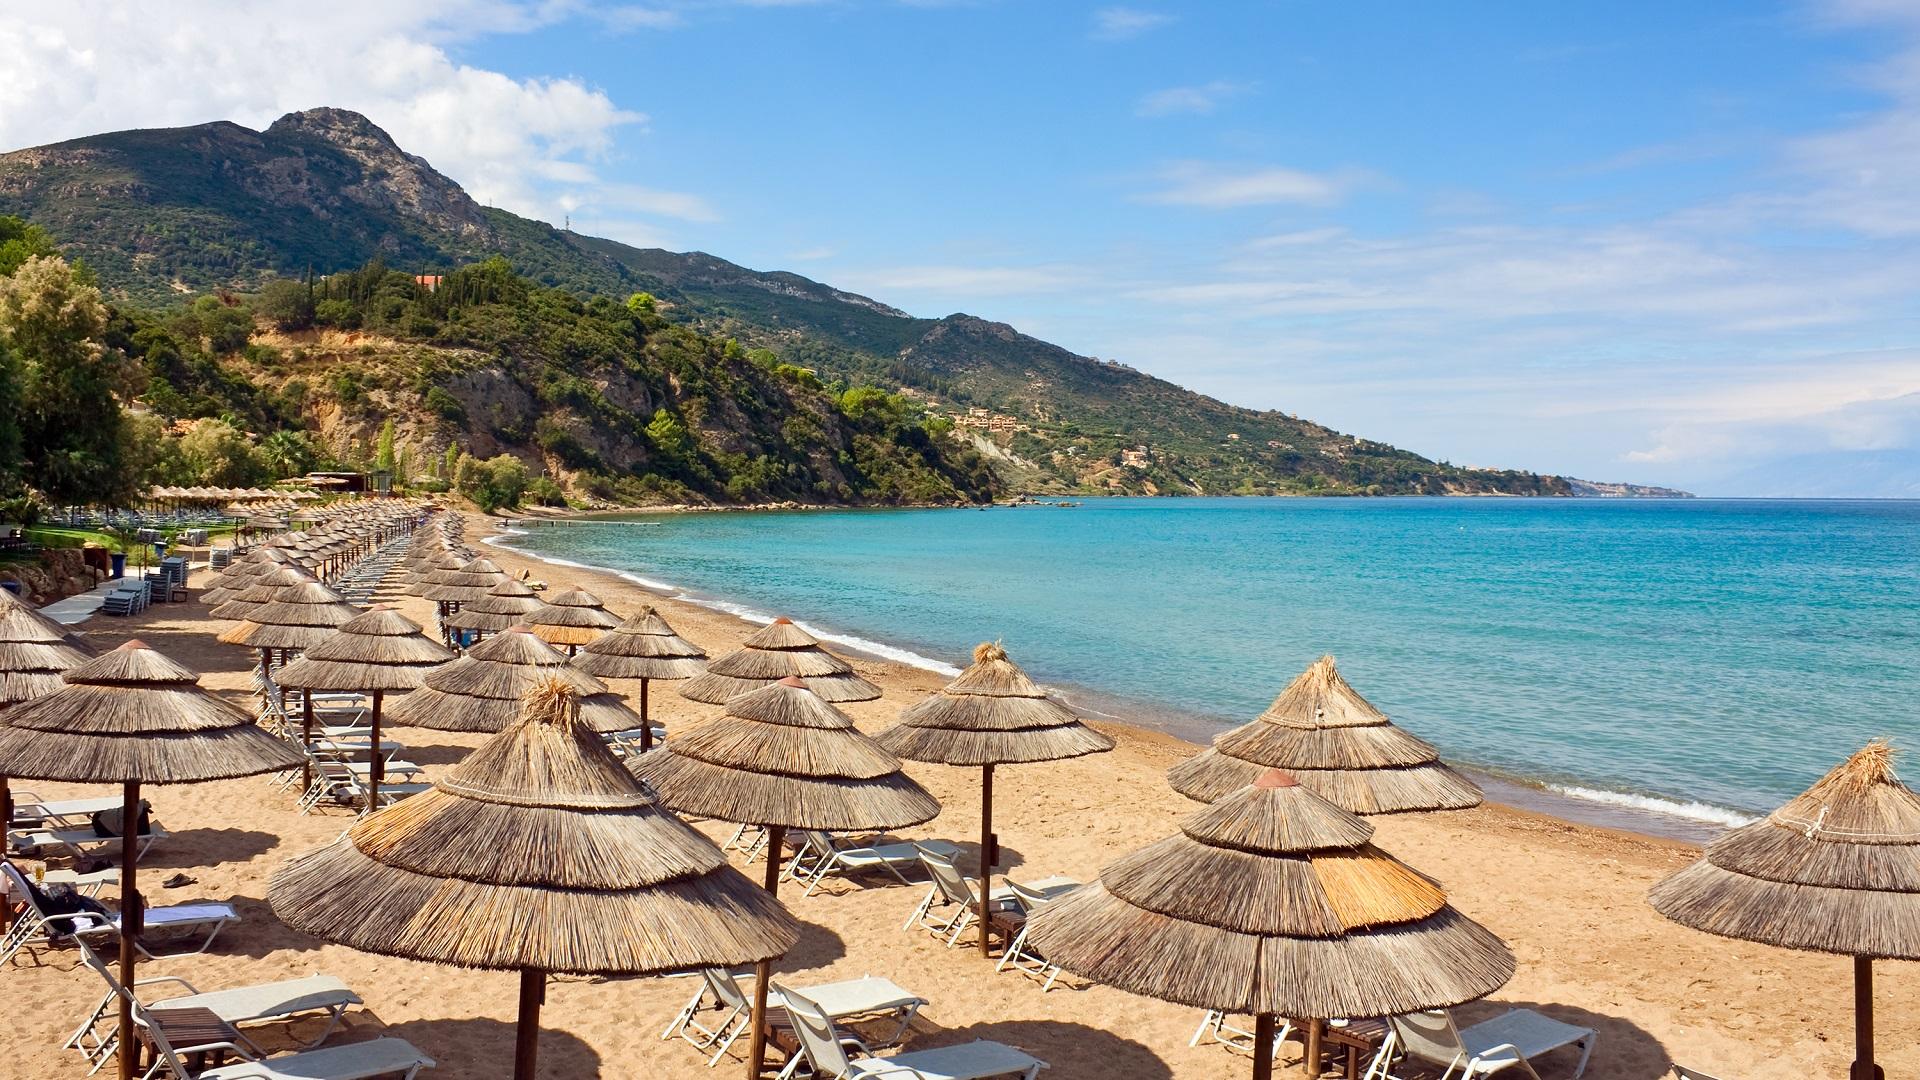 Strand met parasols op Zakynthos